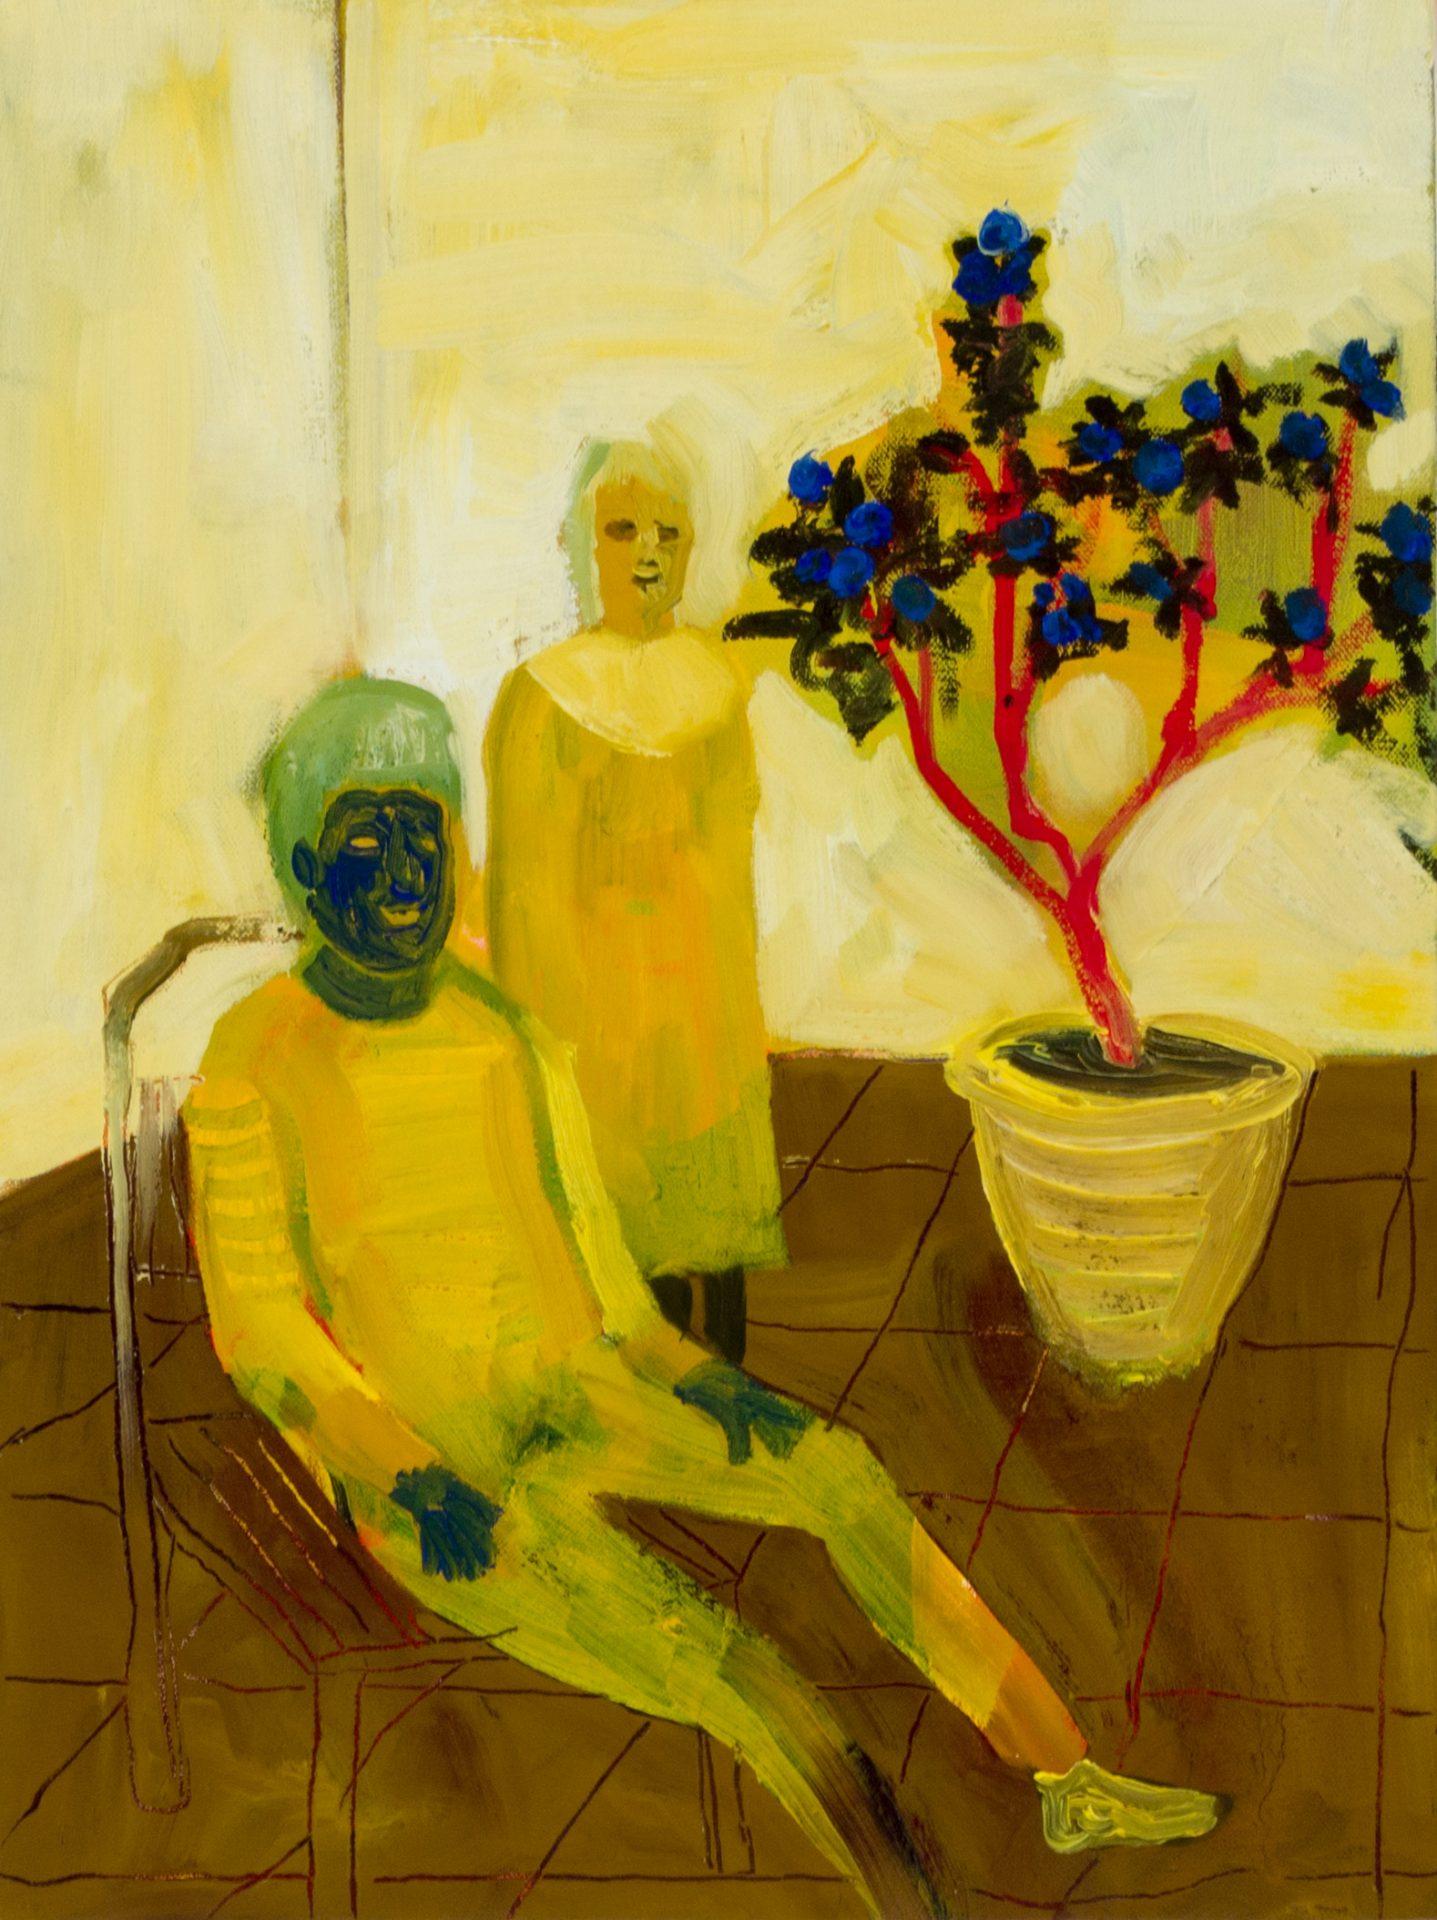 黃海欣 Huang HaiHsin, 無題 Untitled, 2020, 畫布油彩 oil on canvas, 40 x 30 cm-2